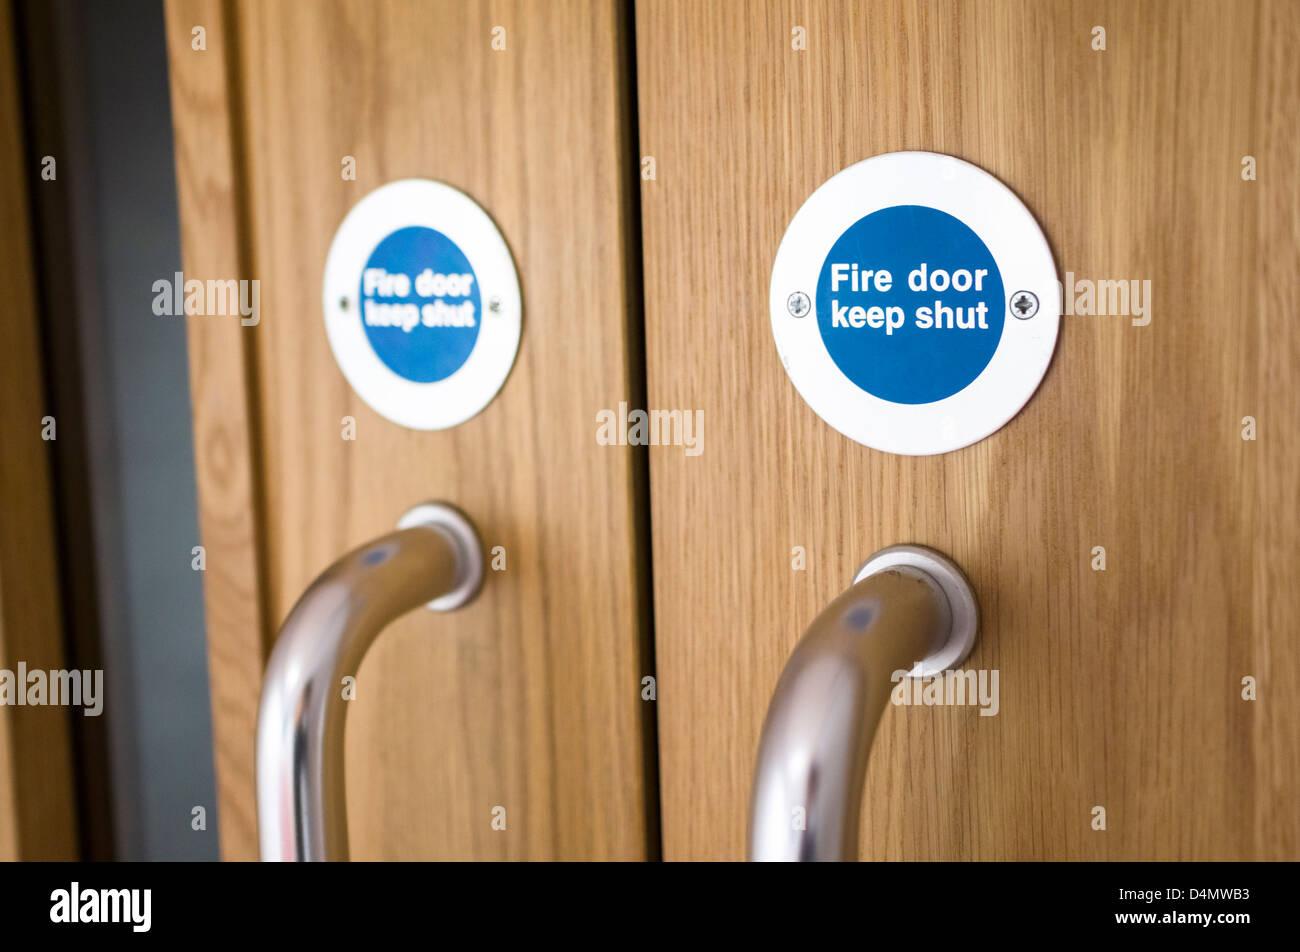 Fire door keep shut signs. & Fire door keep shut signs Stock Photo Royalty Free Image ... Pezcame.Com